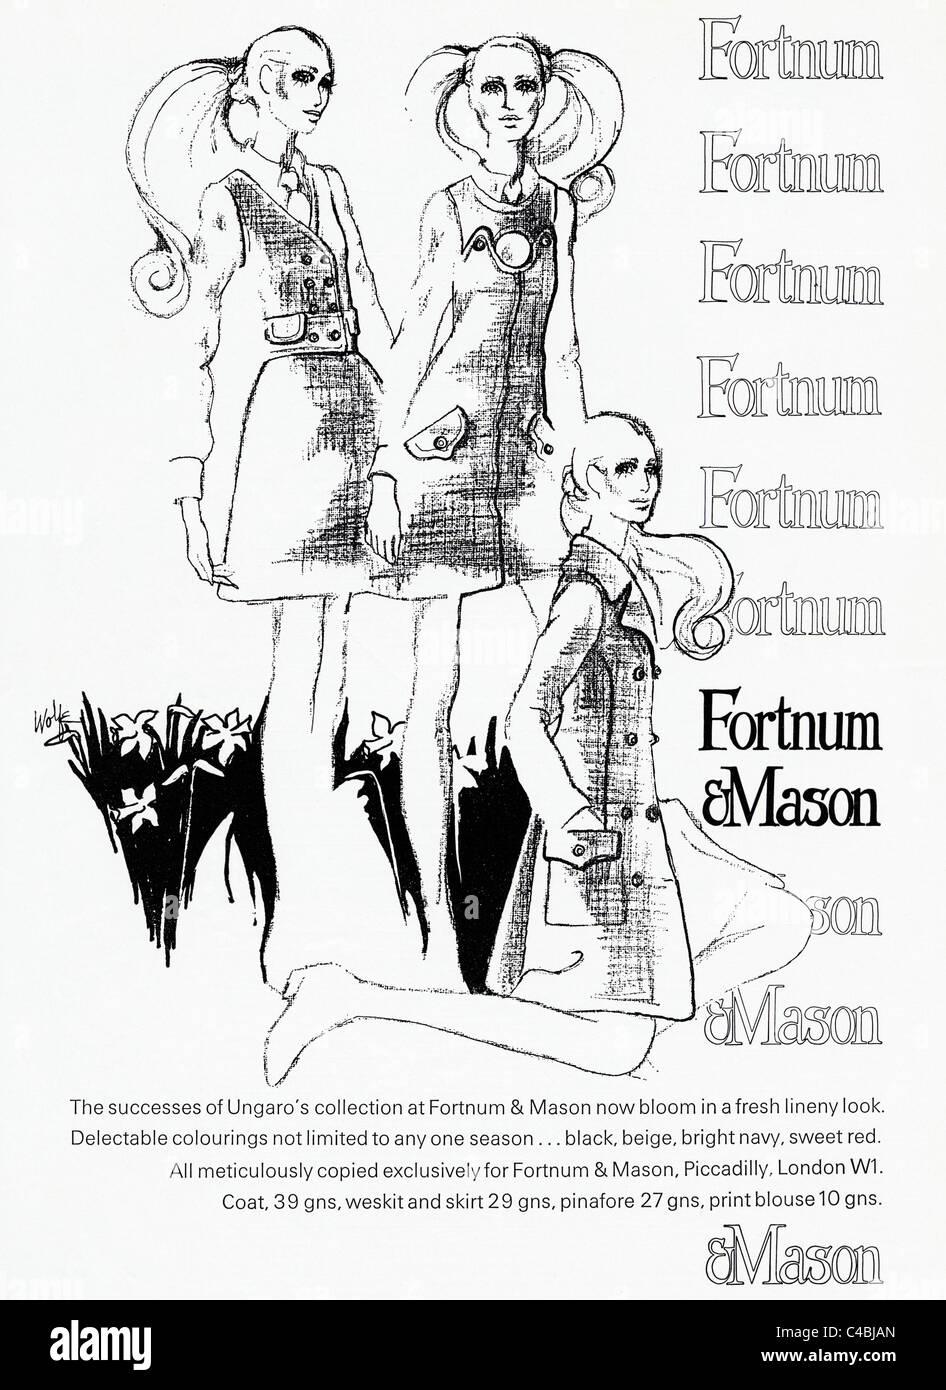 Full page original advertisement in fashion magazine circa 1969 for UNGARO'S collection at FORTNUM & MASON - Stock Image